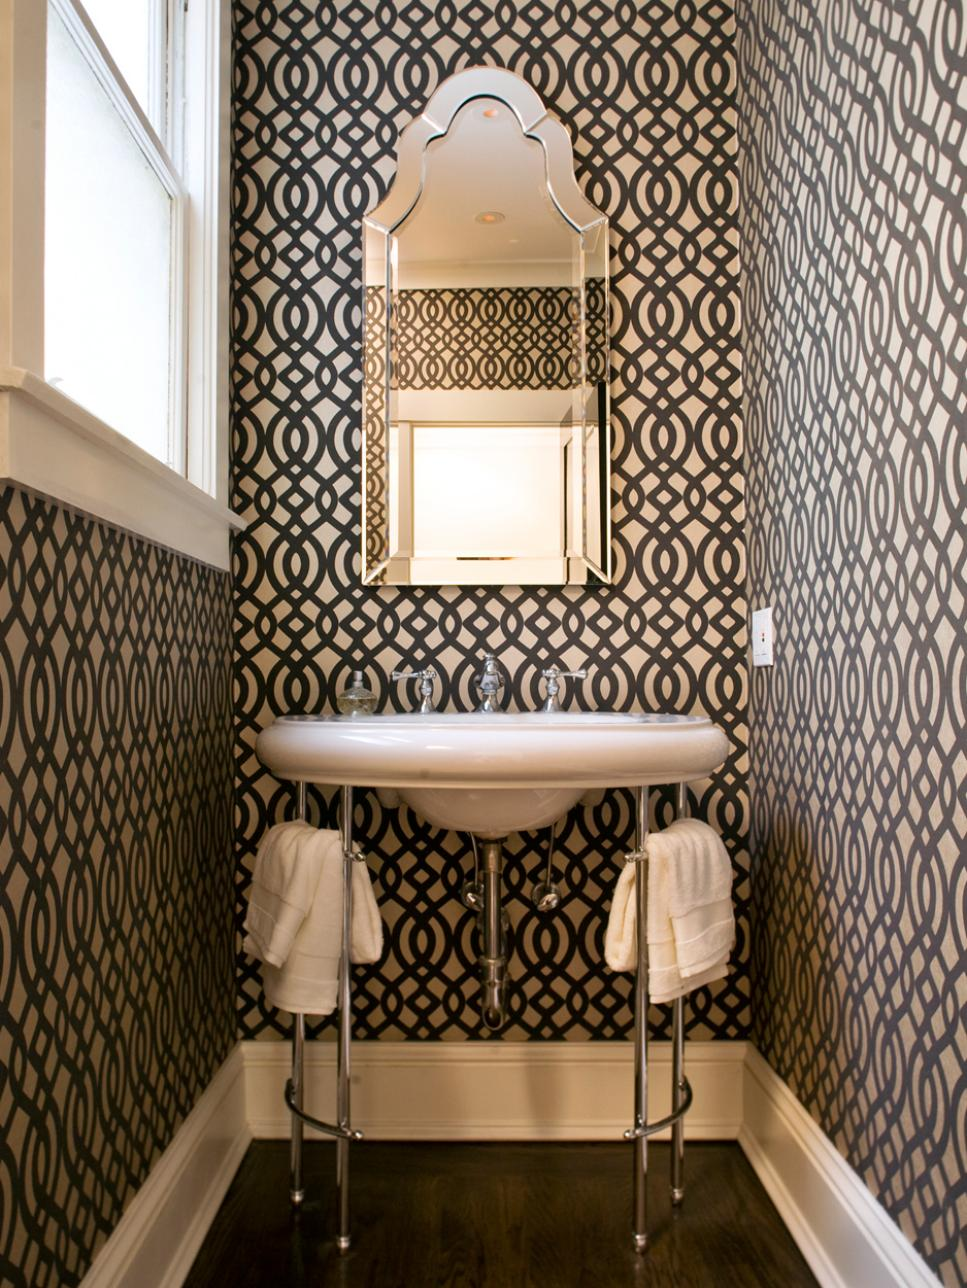 Small Bathroom Design Cool Small Bathroom Remodel Ideas  Jpeg